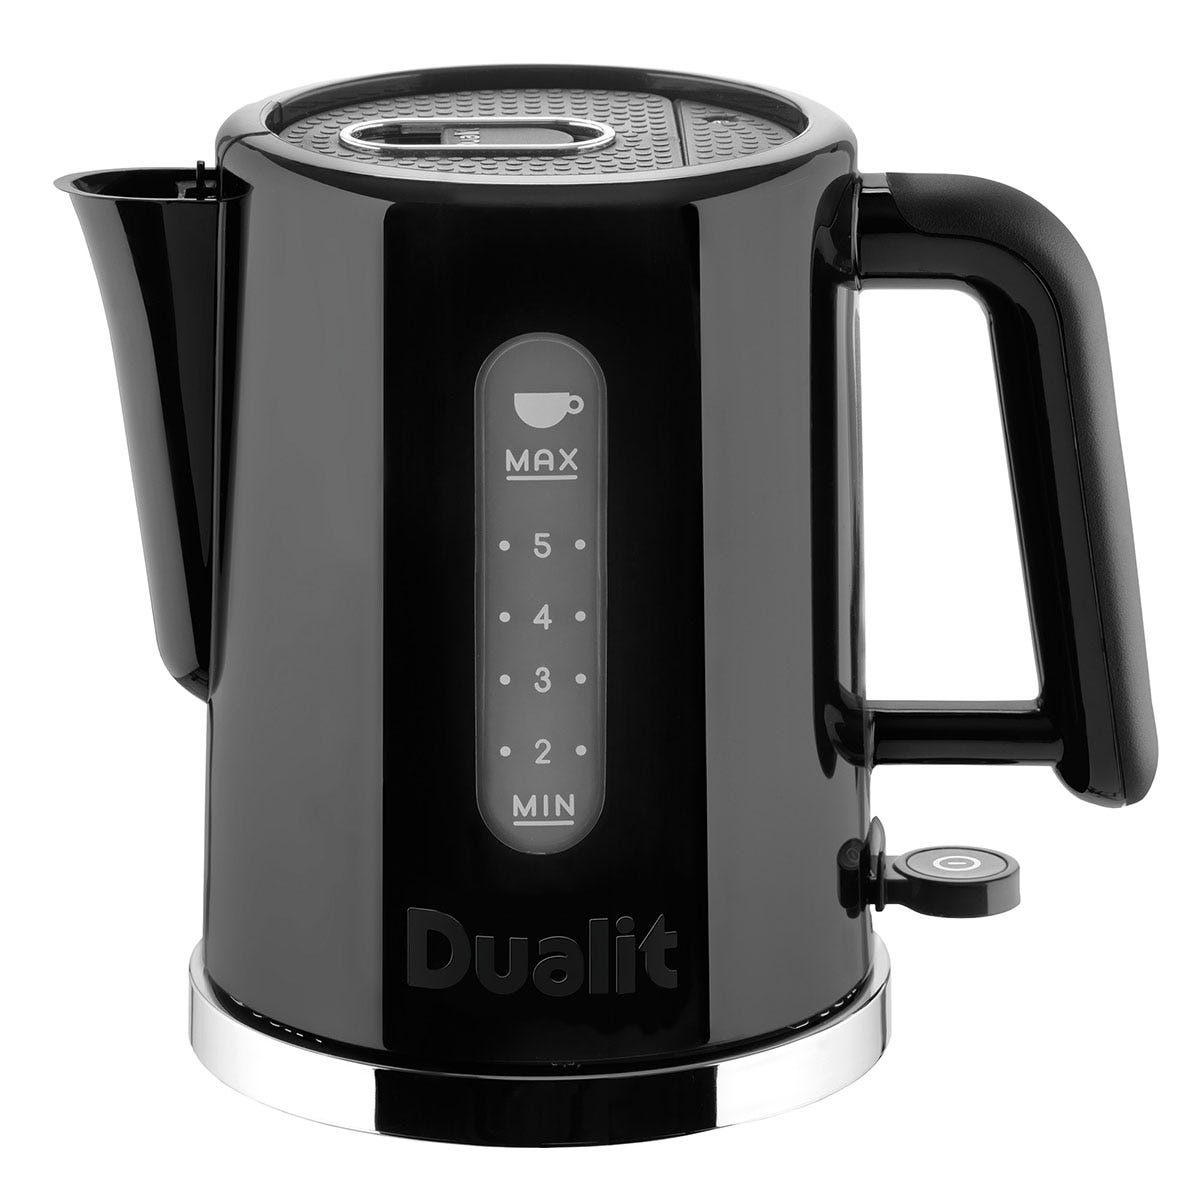 Igenix Dualit DA7212 Studio 1.5L Boil Dry Protected Kettle - Black